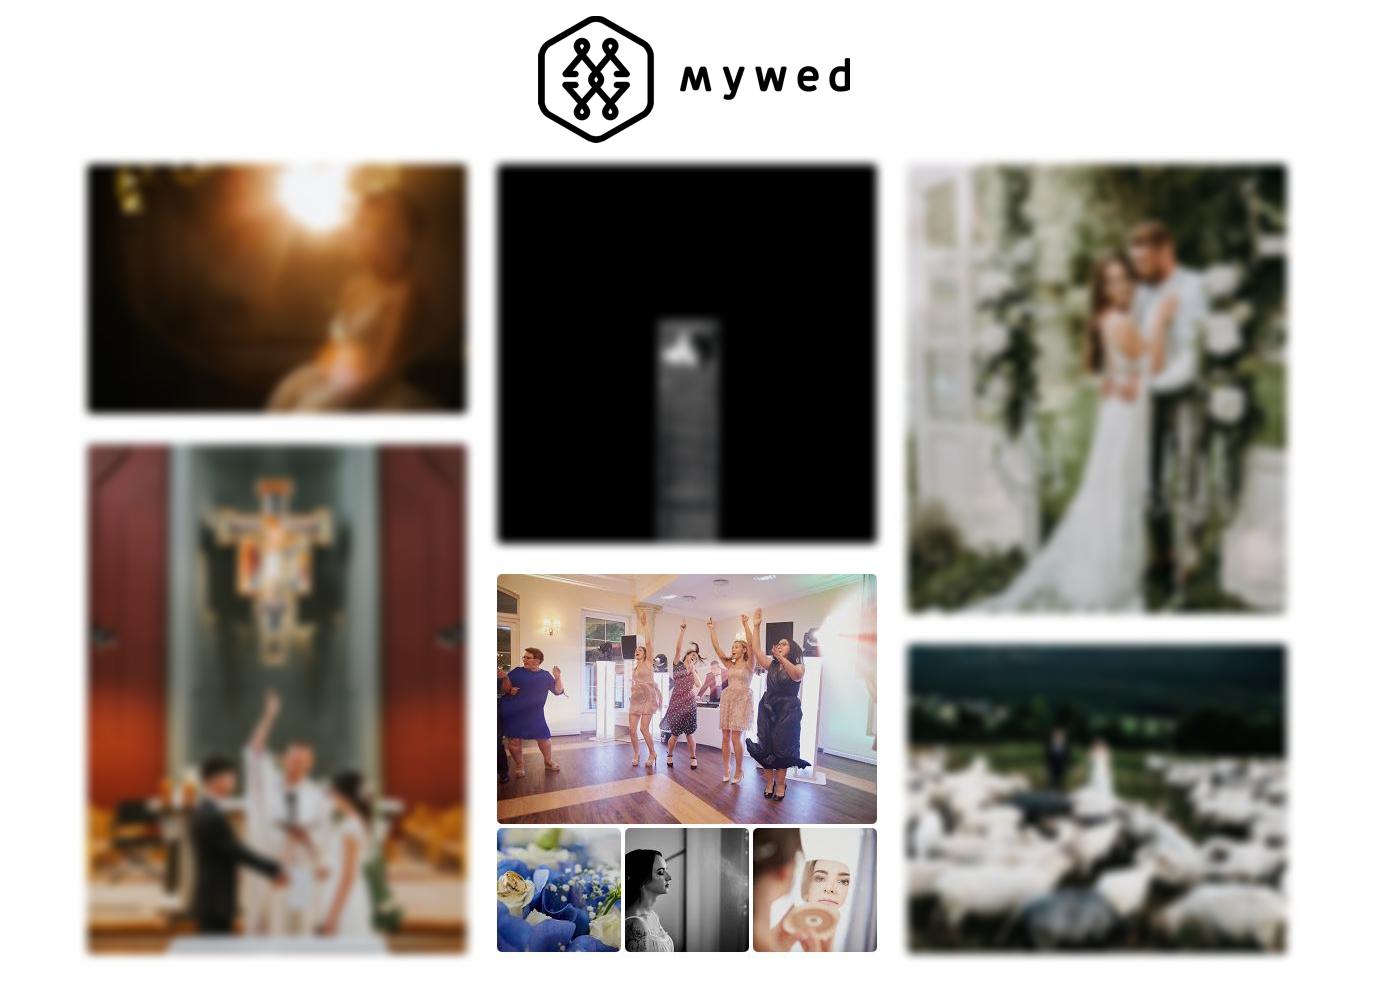 2B4U Studio na MyWed.com